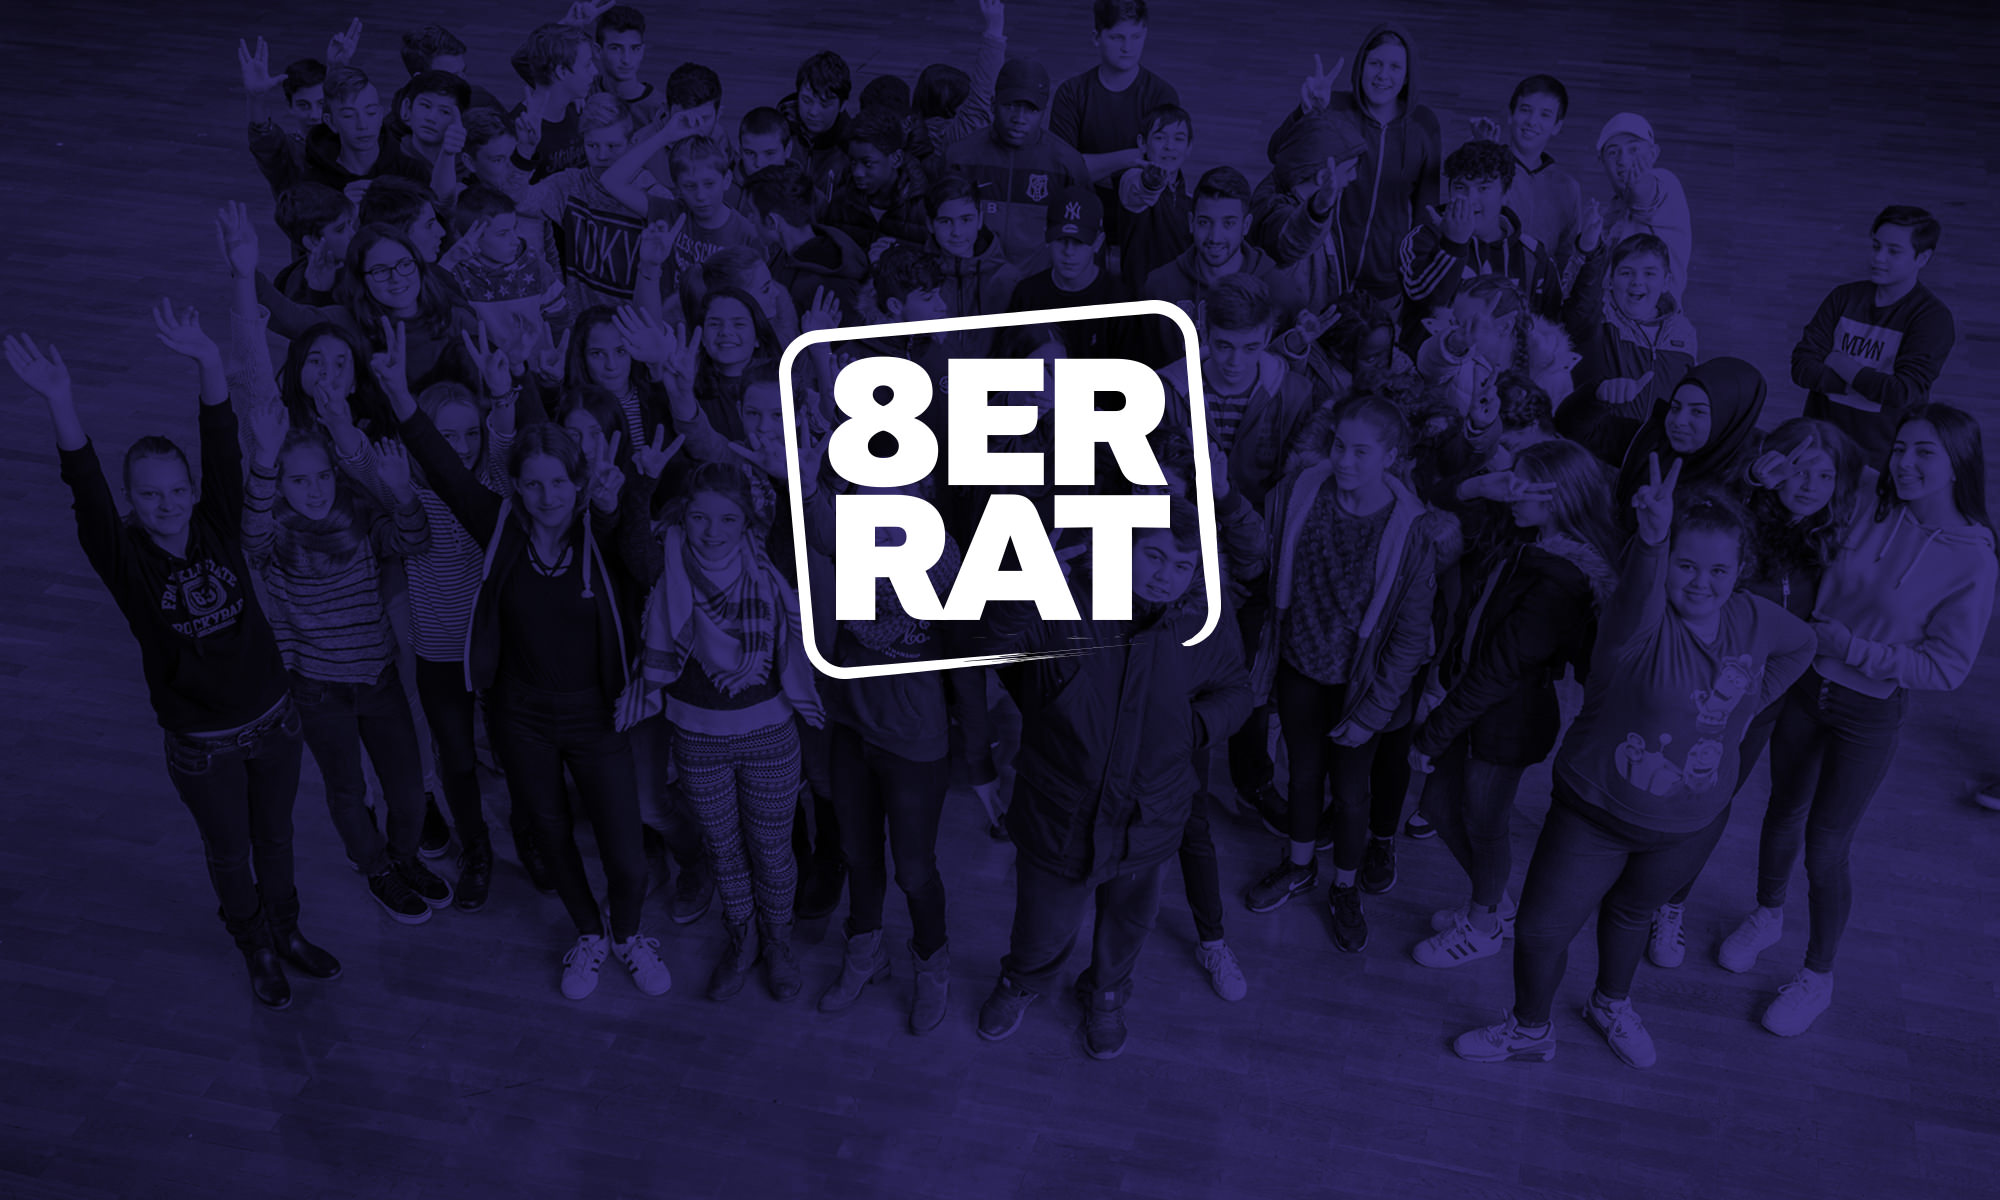 8er-Rat Freiburg